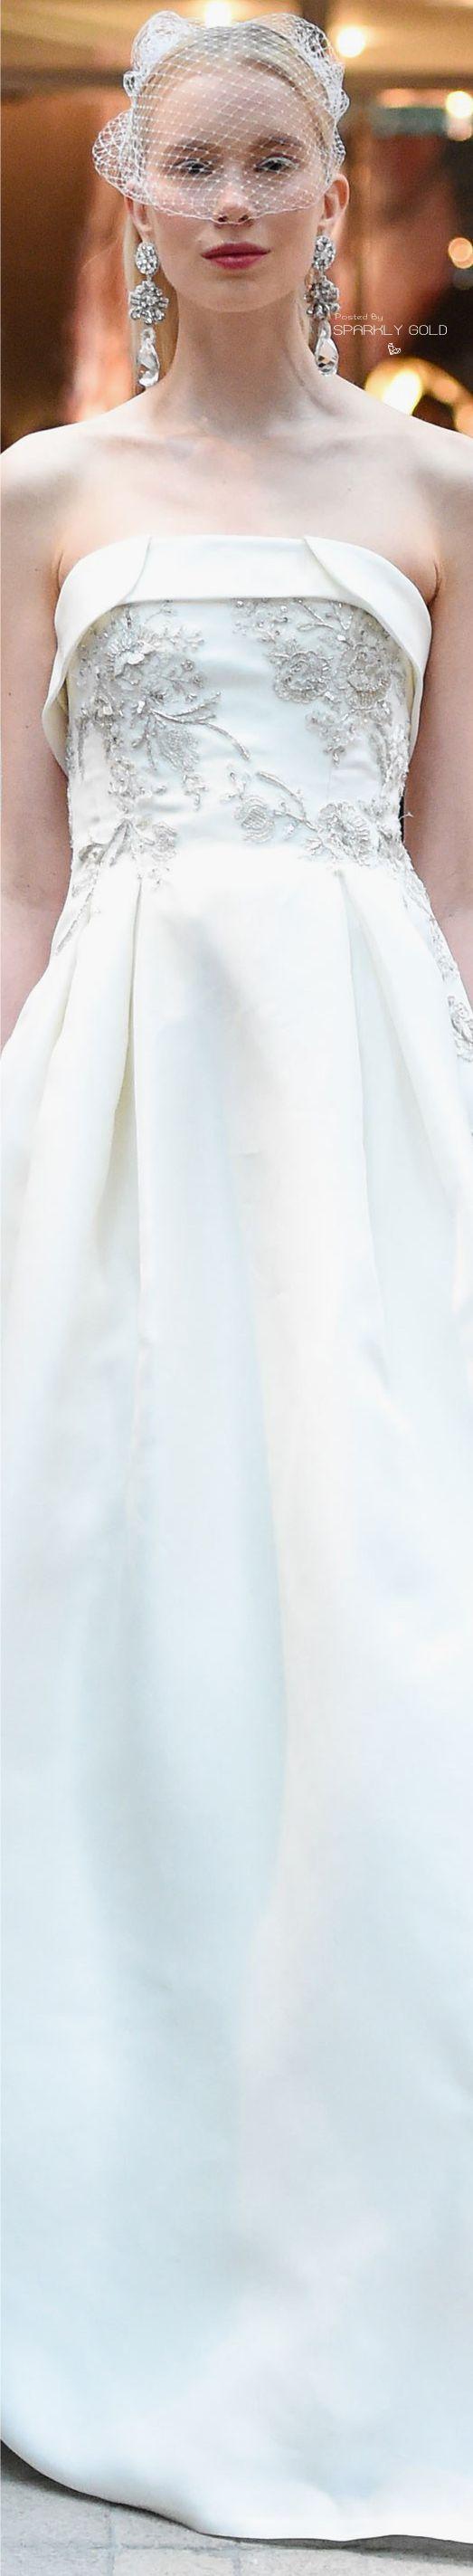 best shades white u cream images on pinterest white